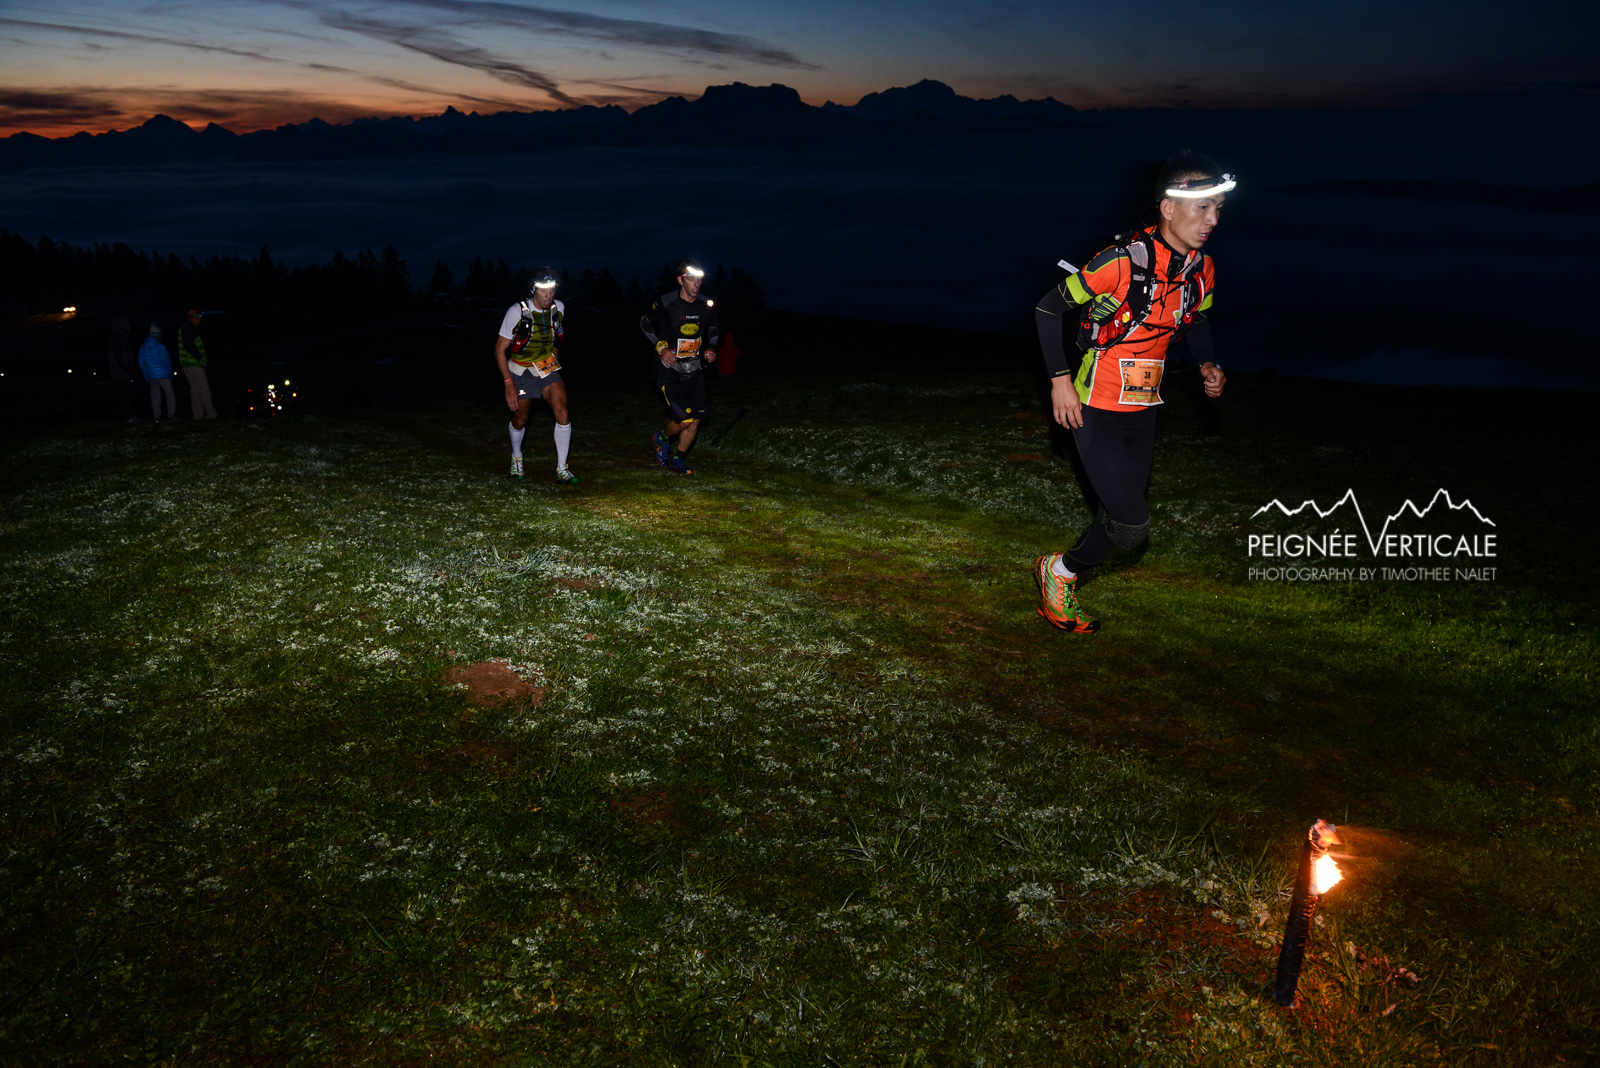 MaxiRace-Annecy-2014-Team-Hoka-Timothee-Nalet-0709.jpg